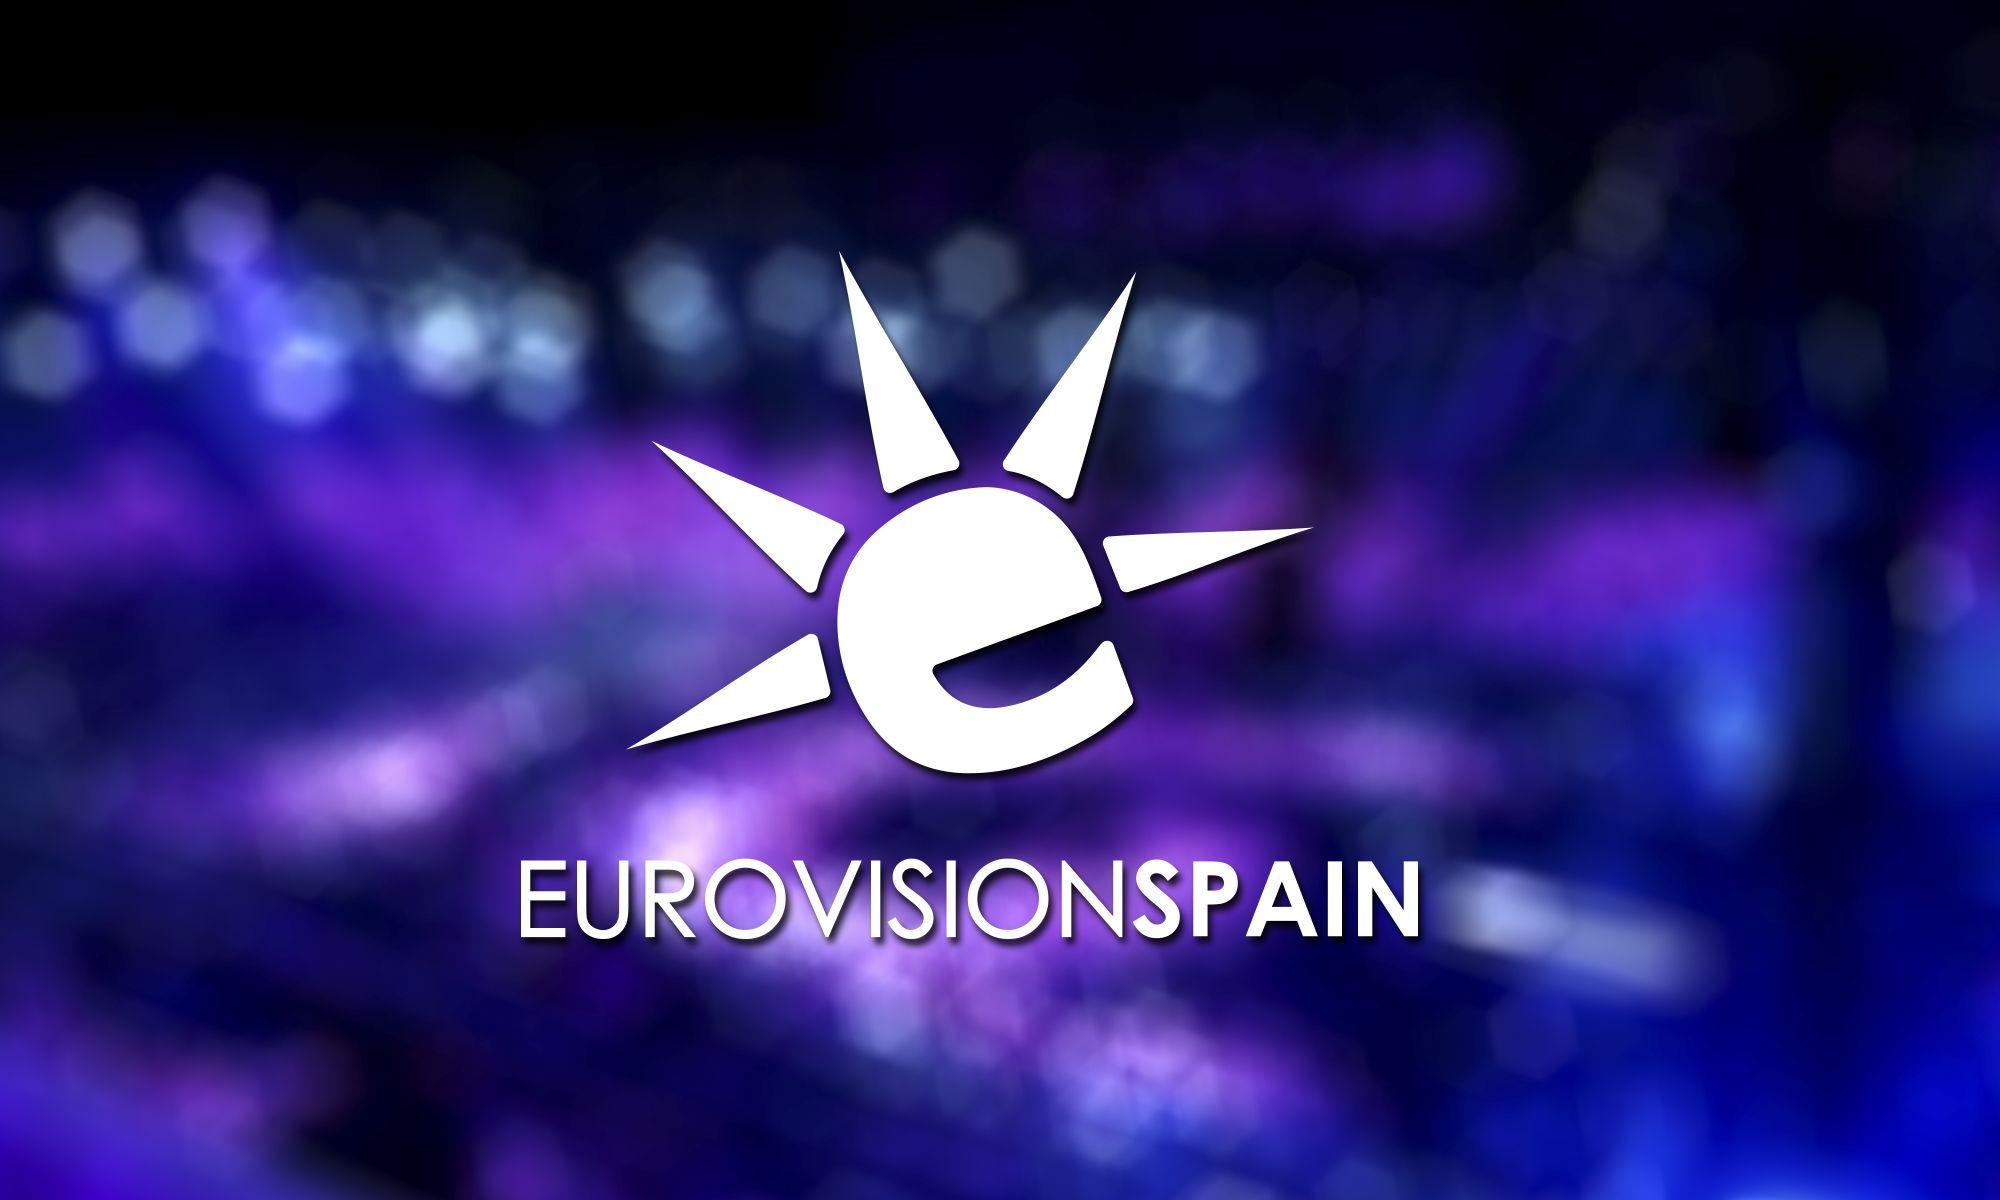 sin_ano_30122014_033432_logo_eurovisionspain_grande-1